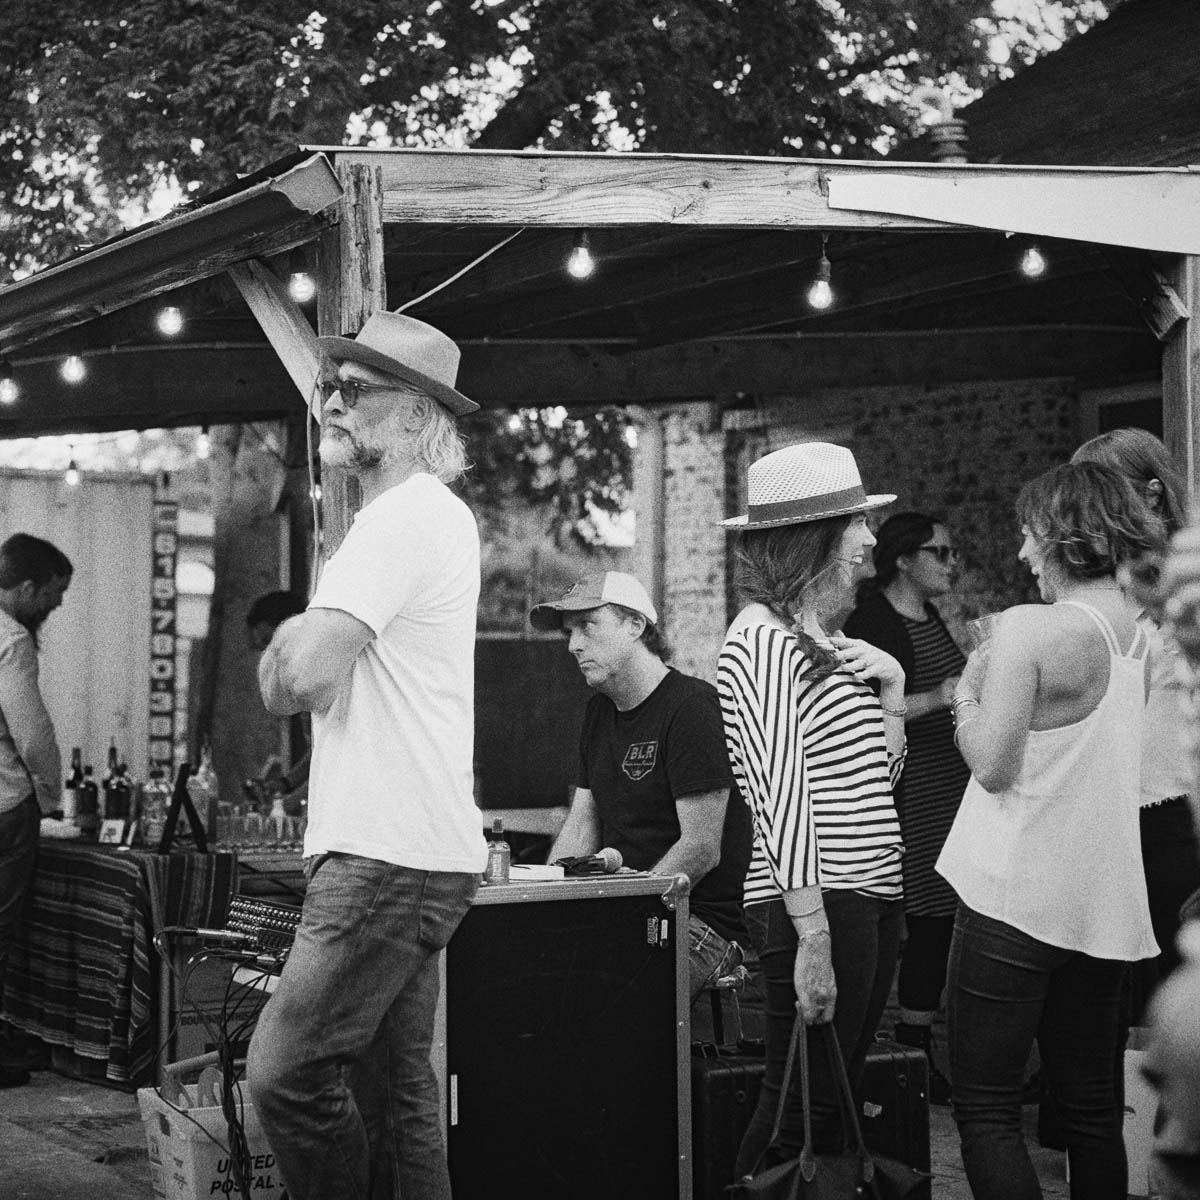 nashville black and white film event photographer documentary ©2015abigailbobophotography0013.jpg